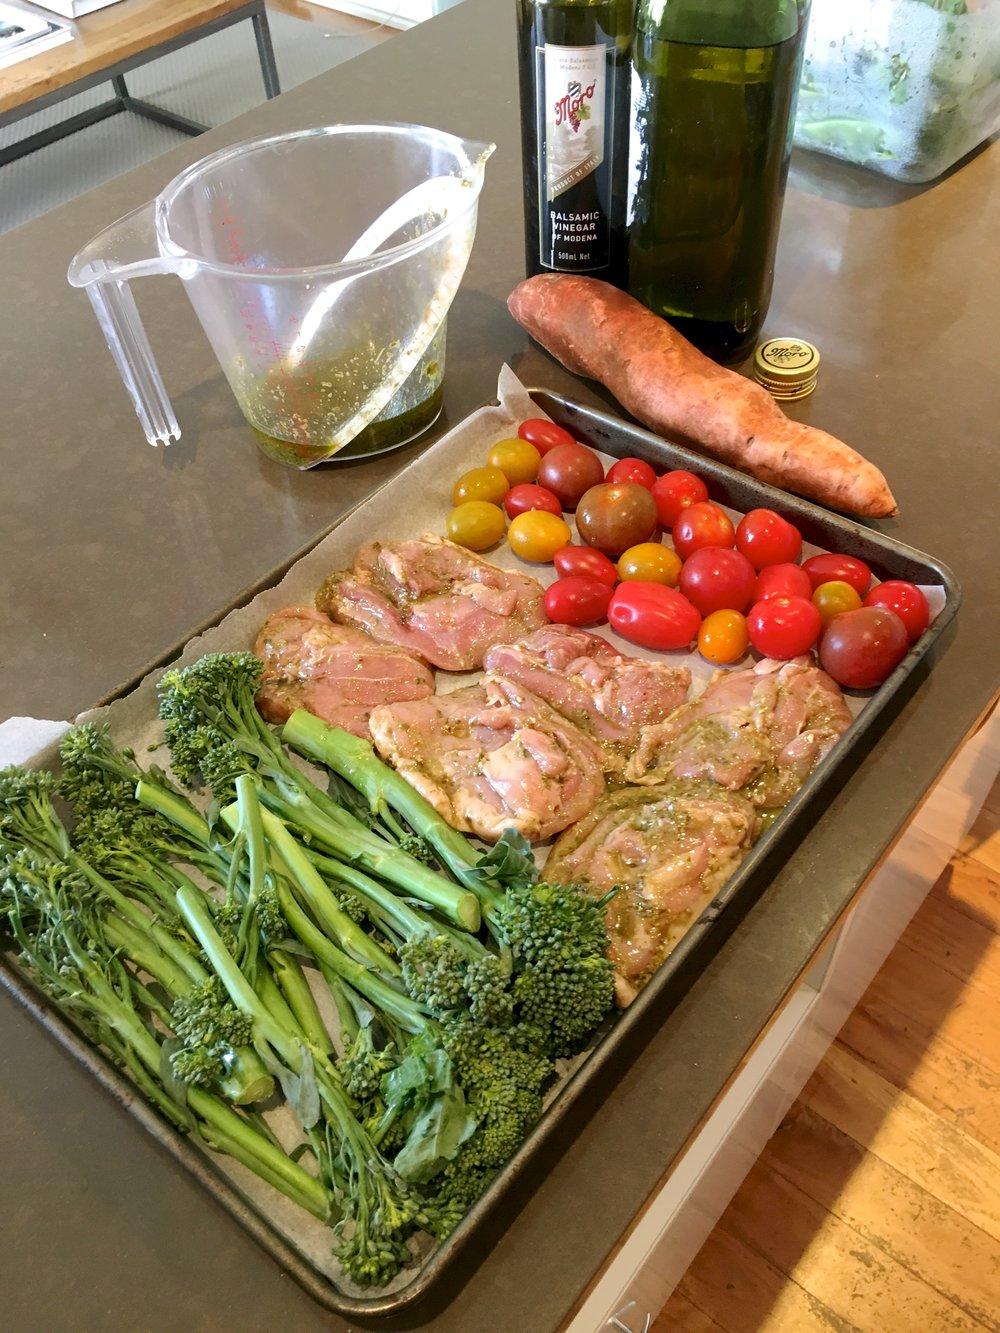 One-tray Balsamic Pesto Chicken healthy recipe